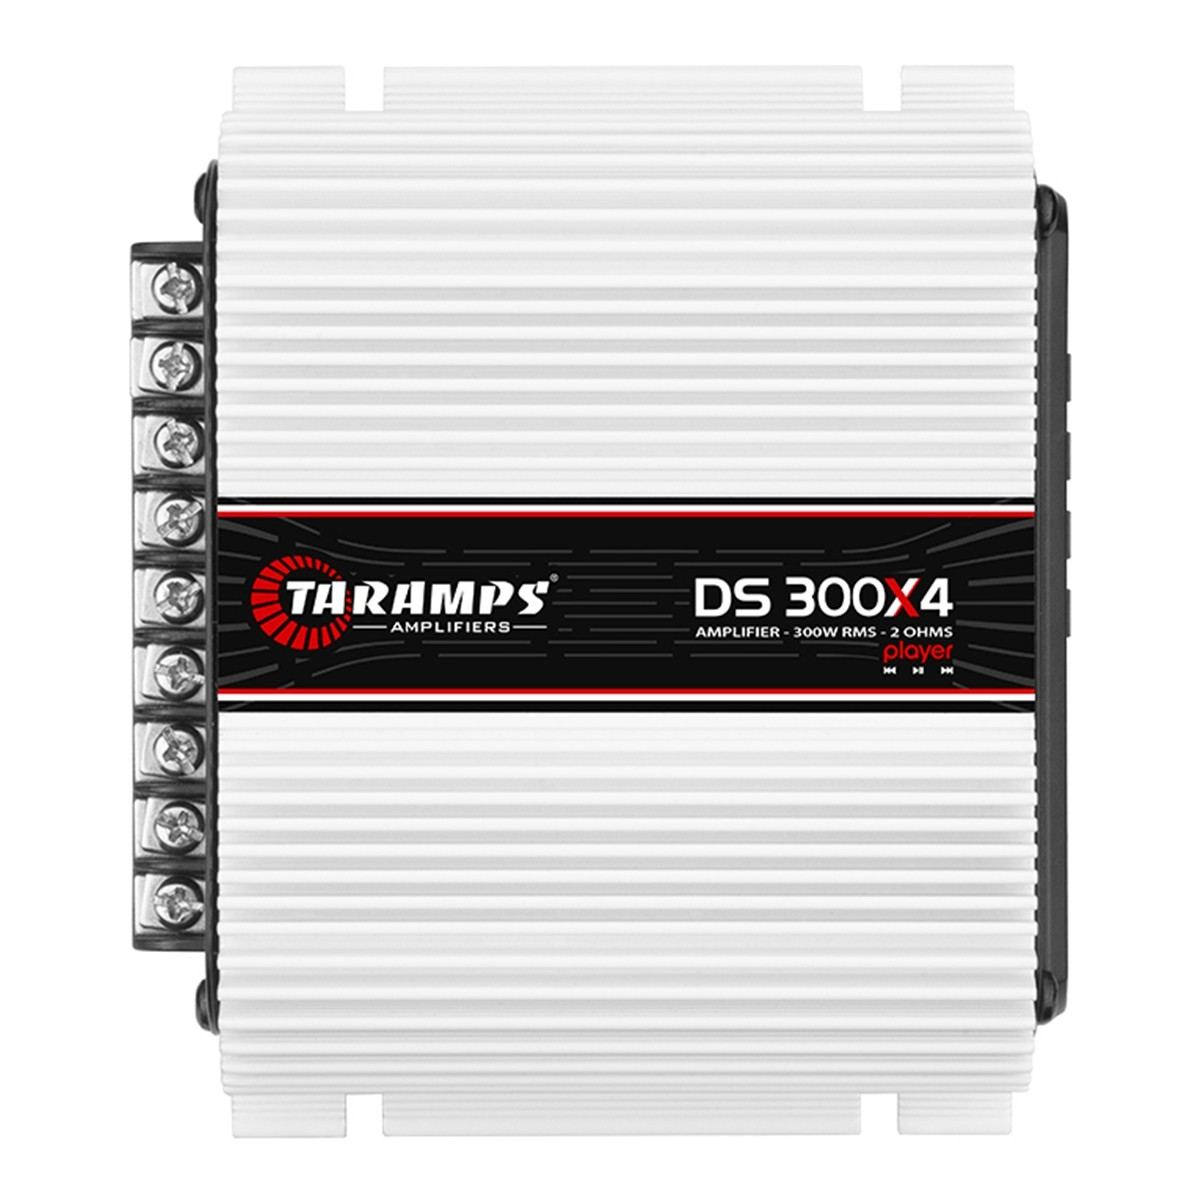 Módulo Amplificador DS 300x4 Player Taramps Class D 2 OHMS 4 Canais